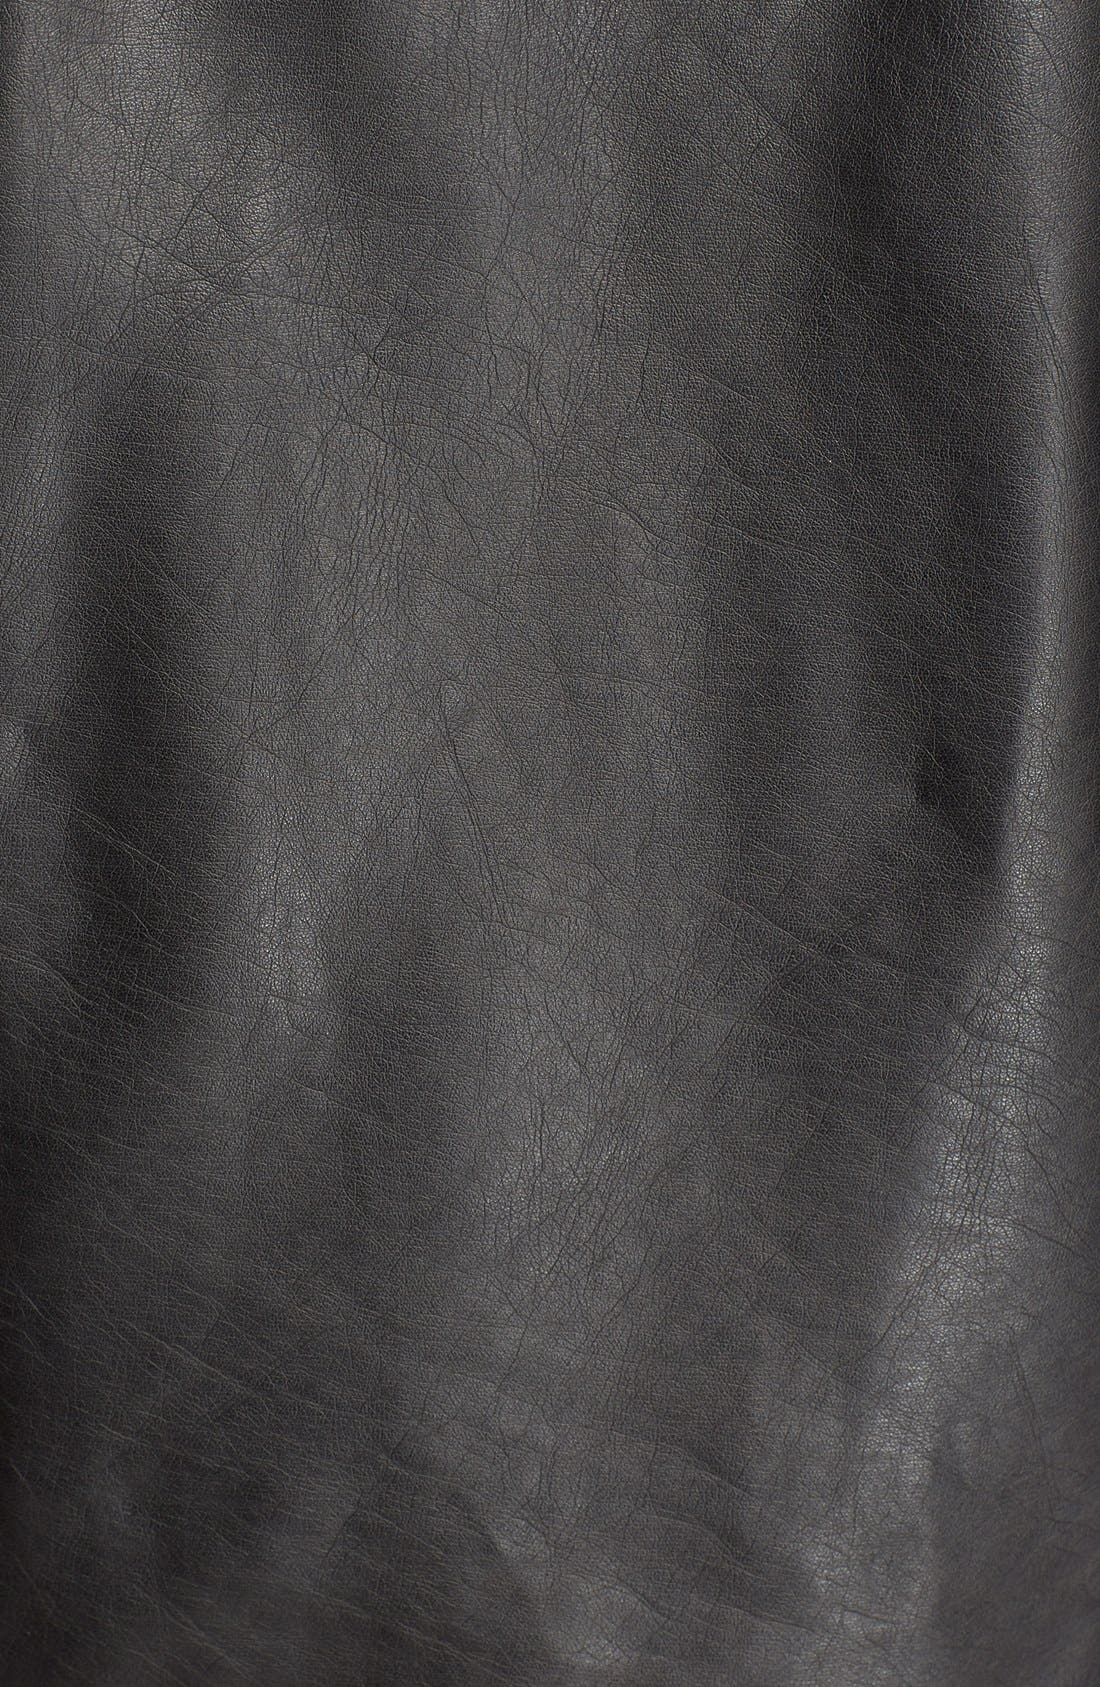 'Exclusive' Faux Leather Jacket,                             Alternate thumbnail 4, color,                             001